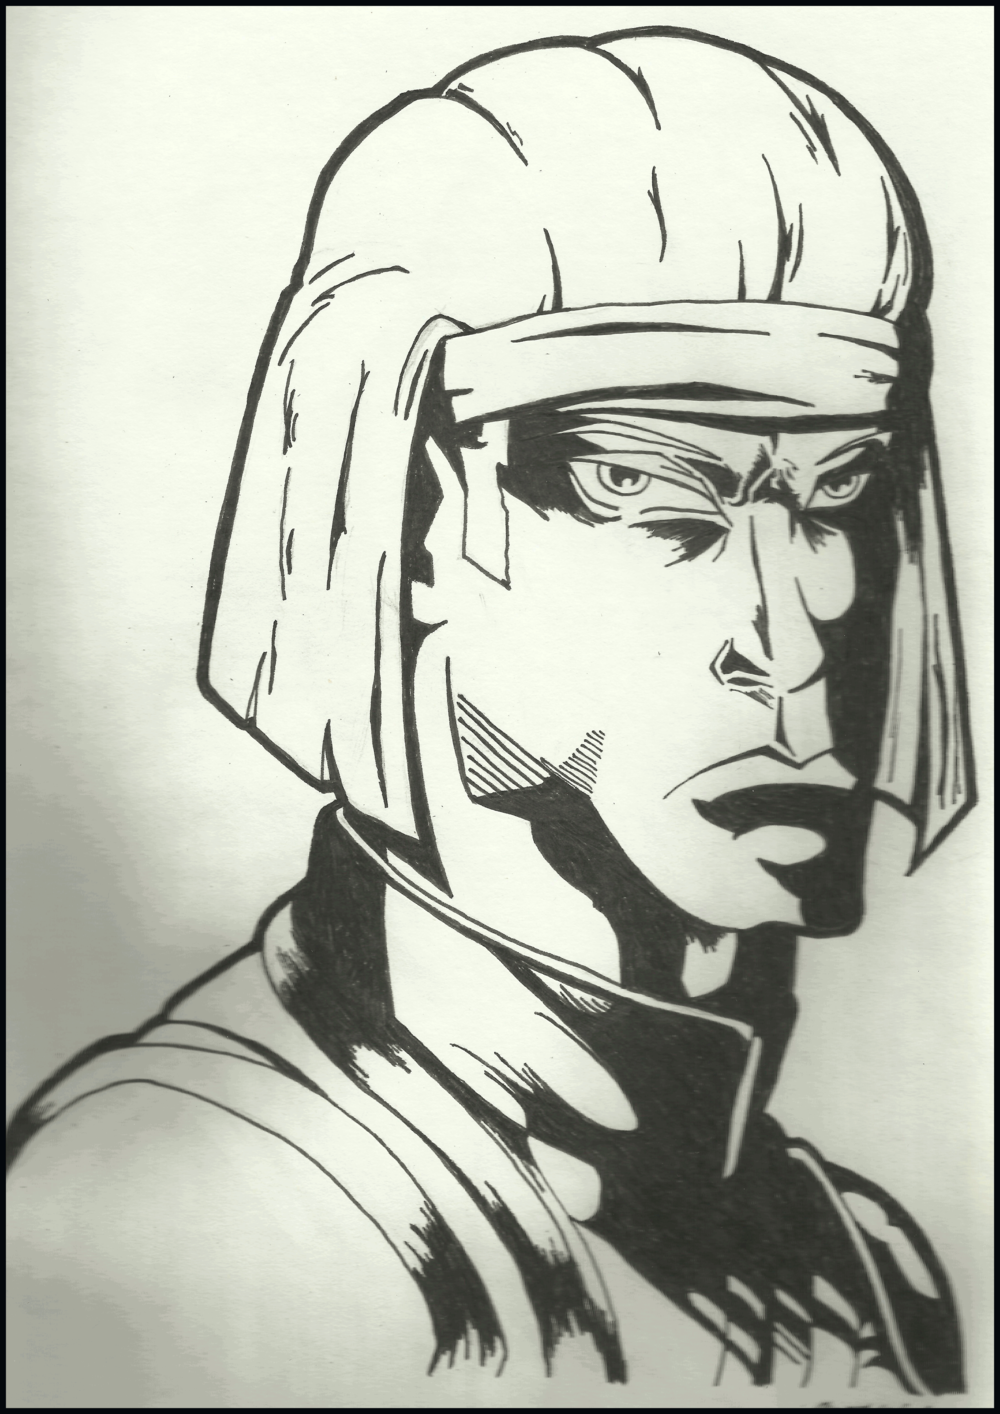 dino-sketch.png